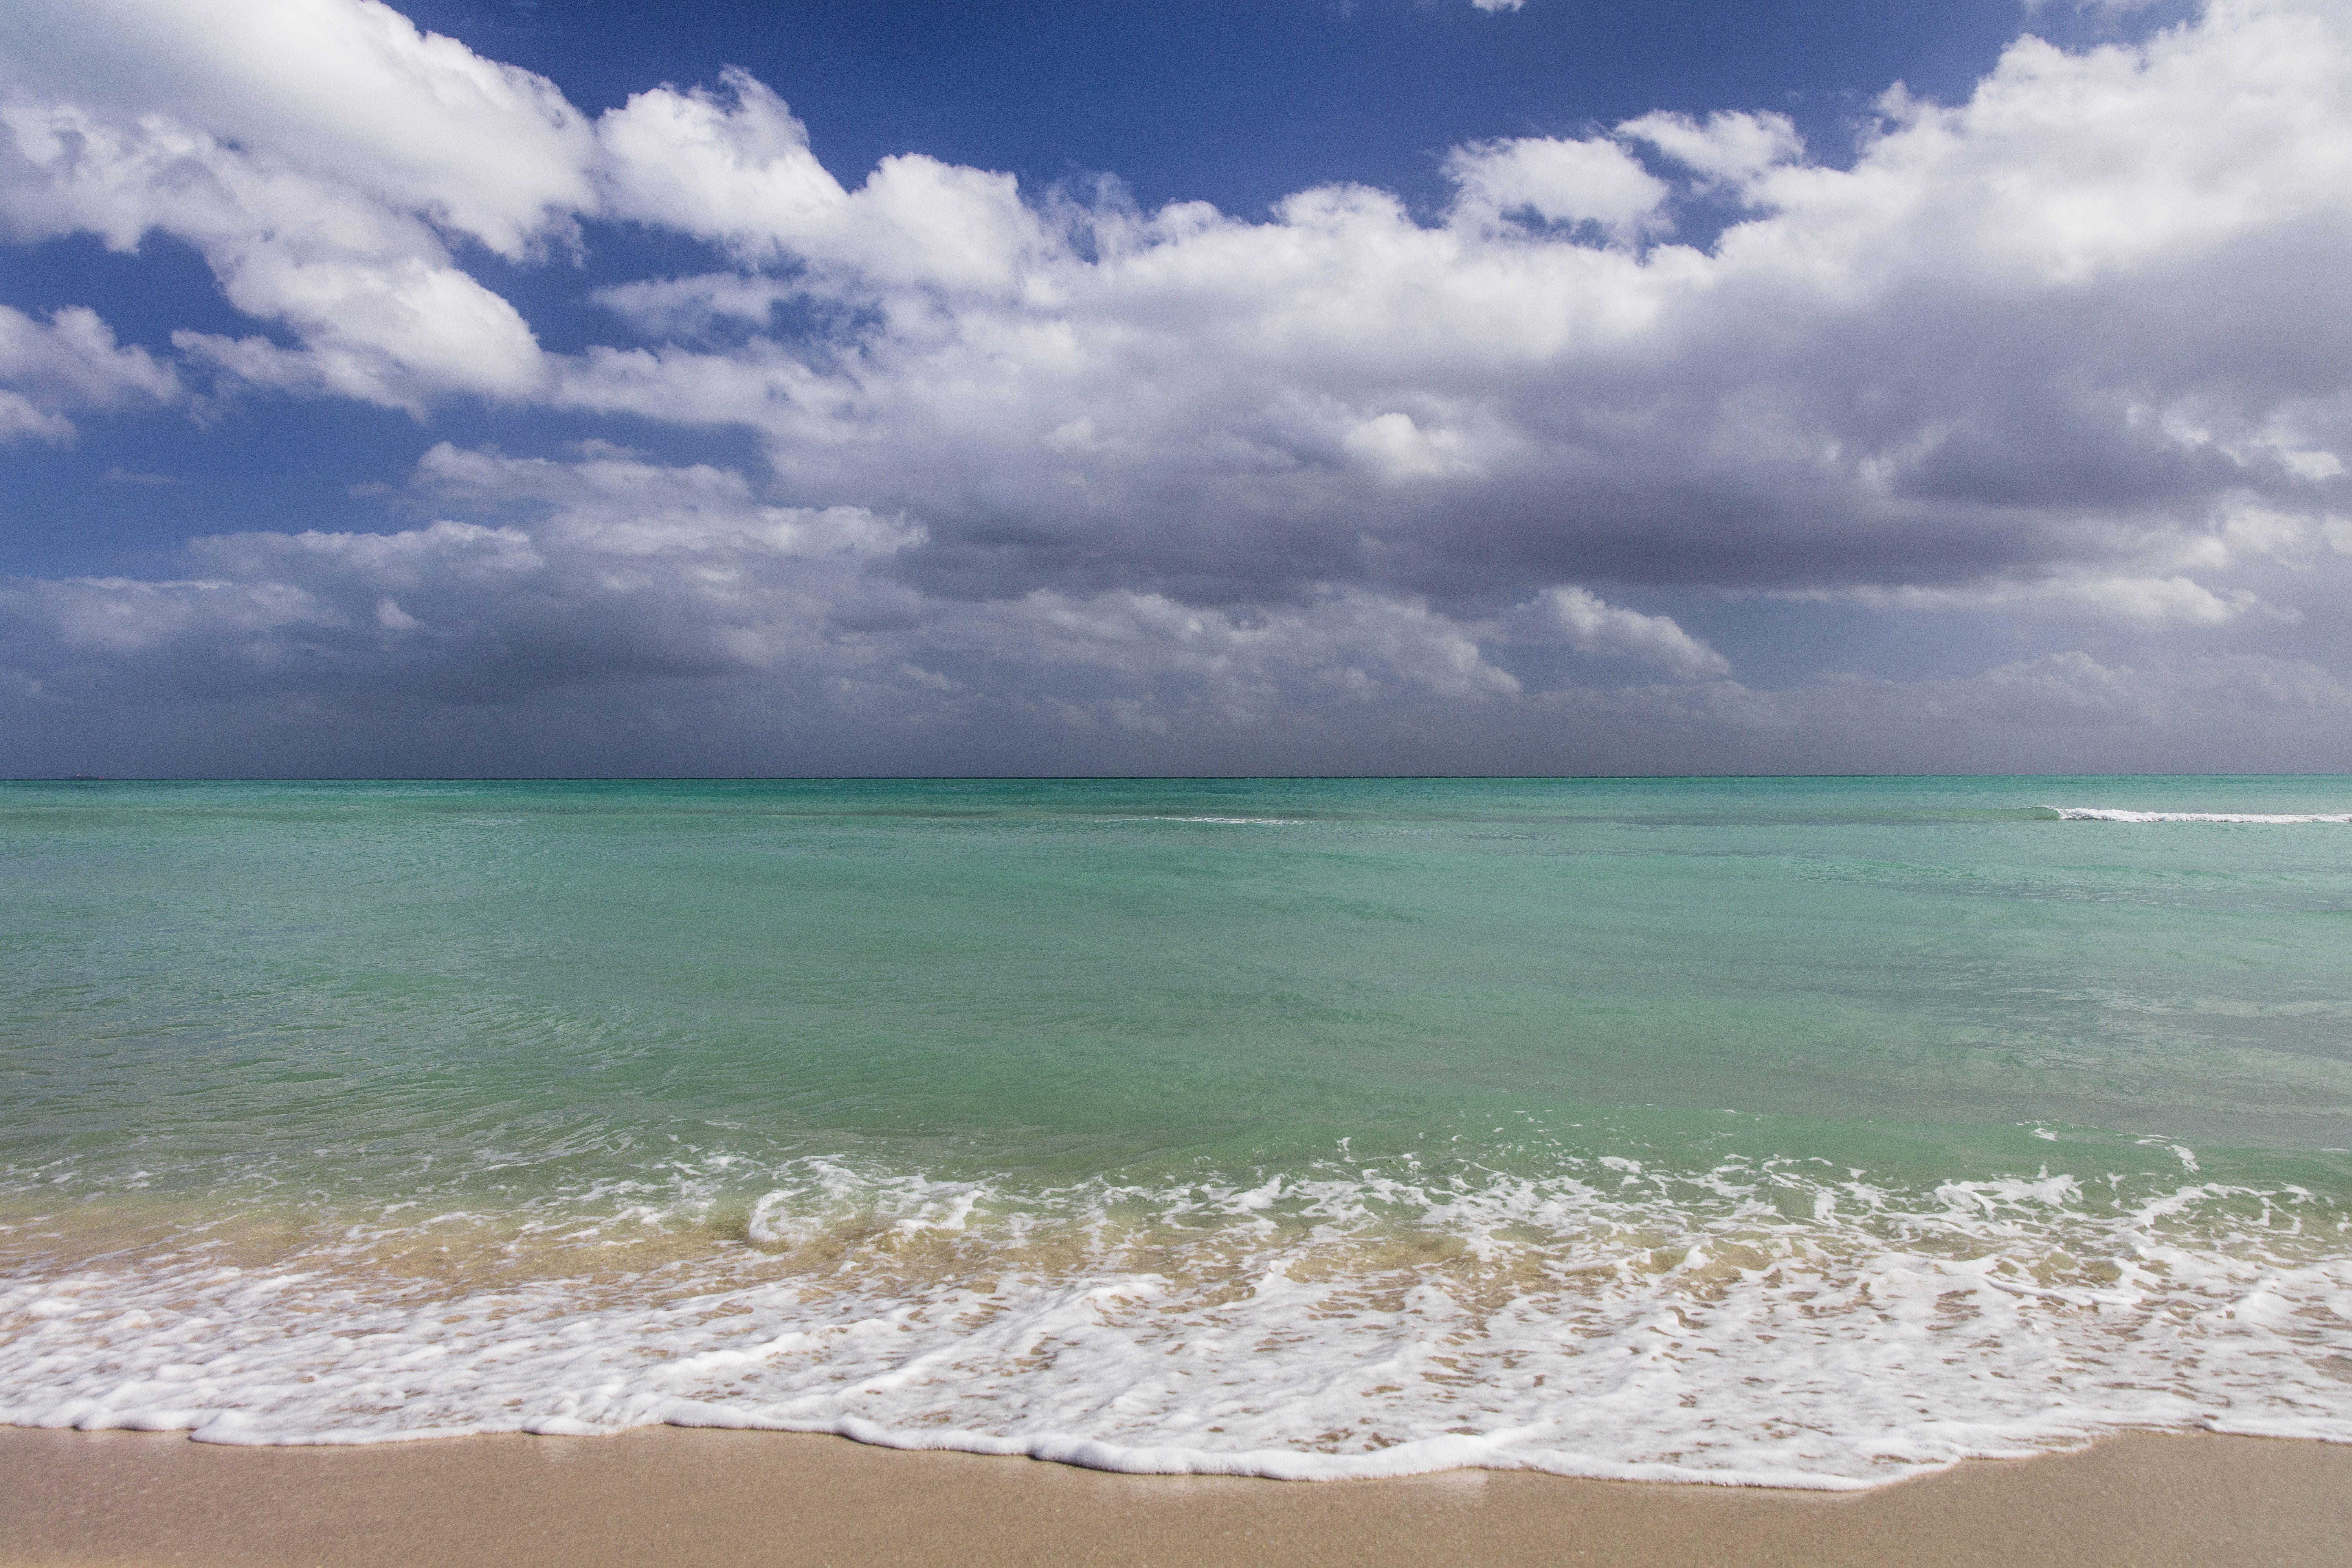 Surfside beach in Miami